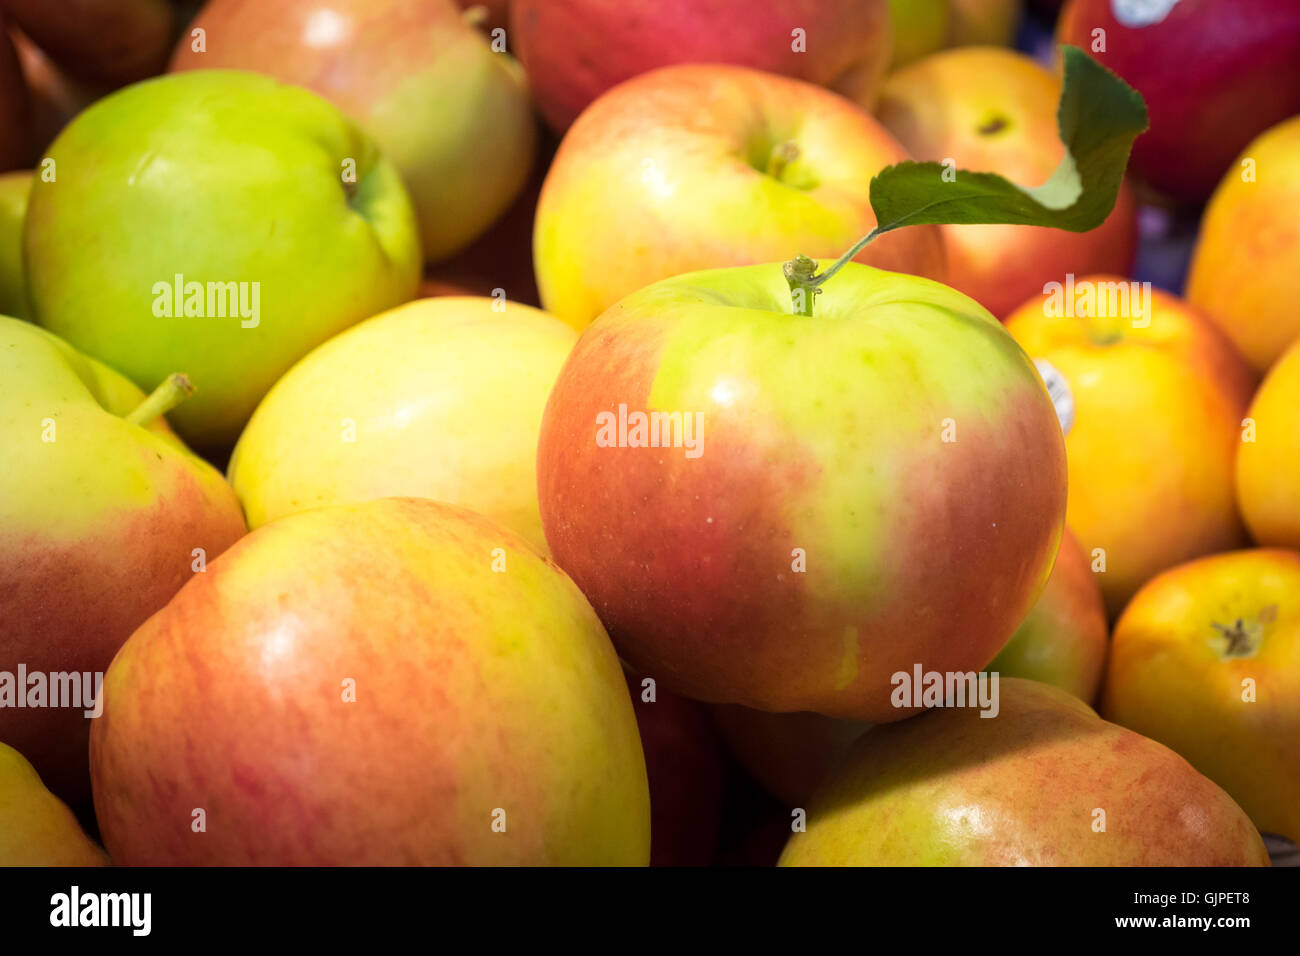 SunCrisp apples for sale at the Granville Island Public Market in Vancouver, British Columbia, Canada. - Stock Image